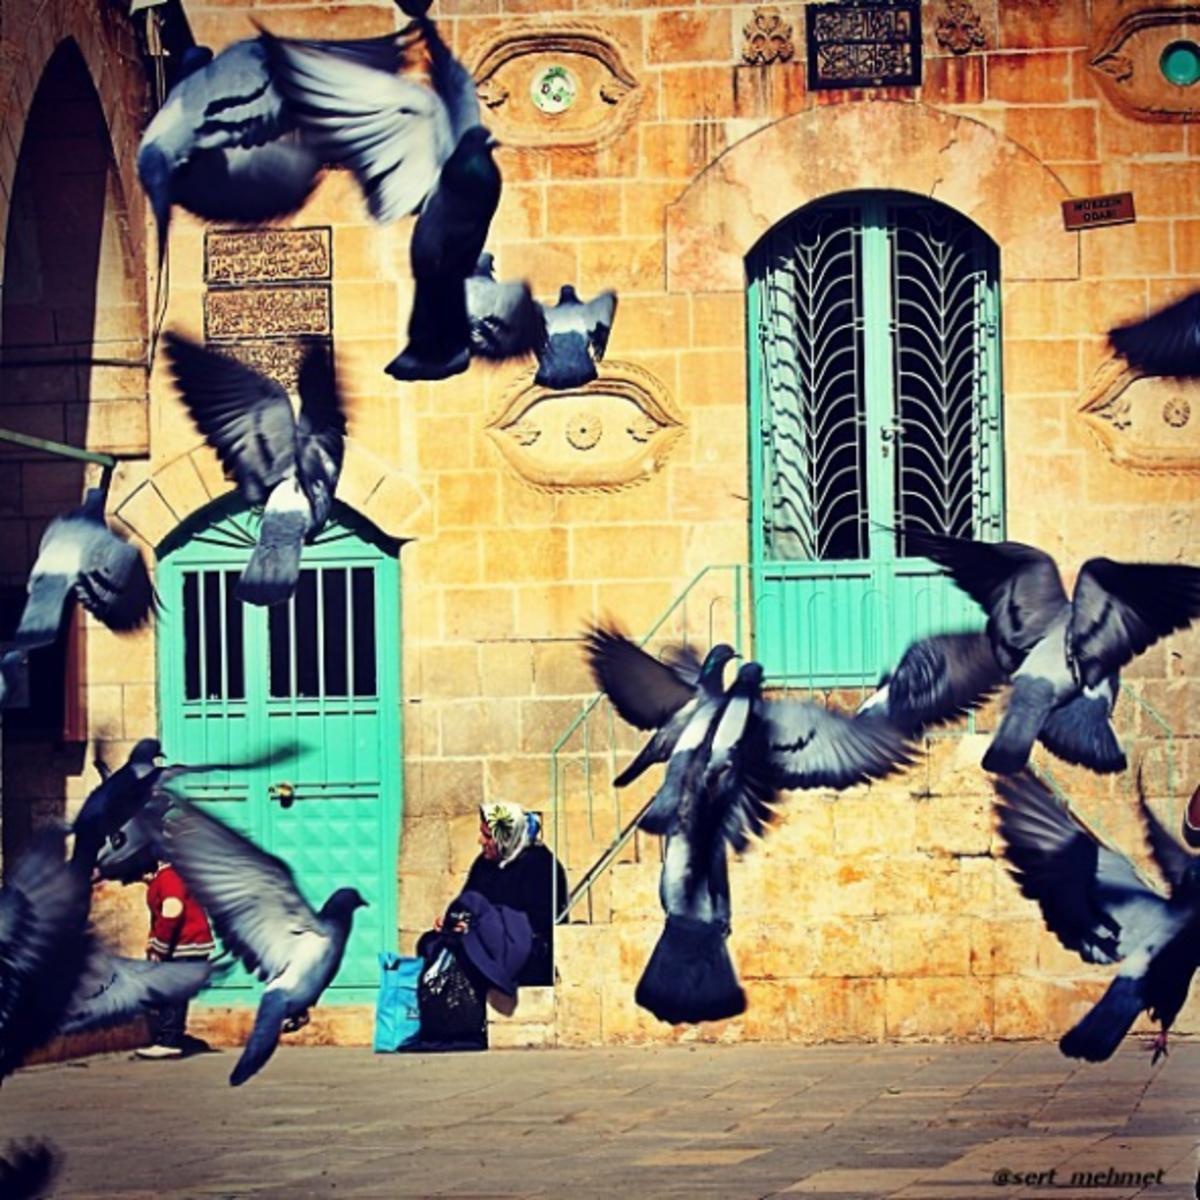 Mehmet Sert photography